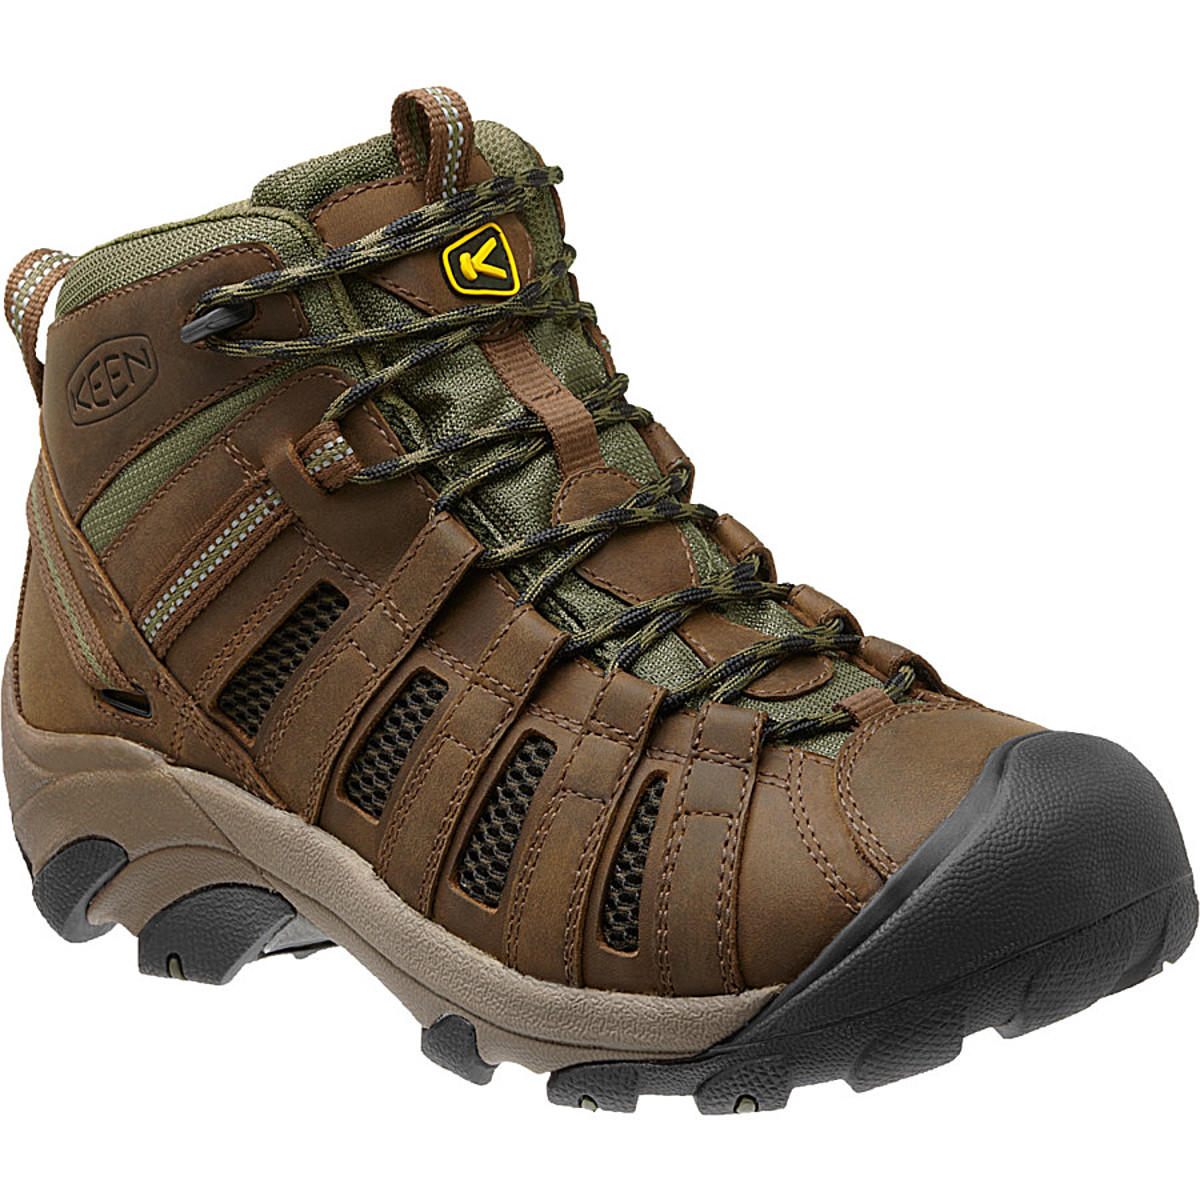 KEEN Voyageur Mid Hiking Boot